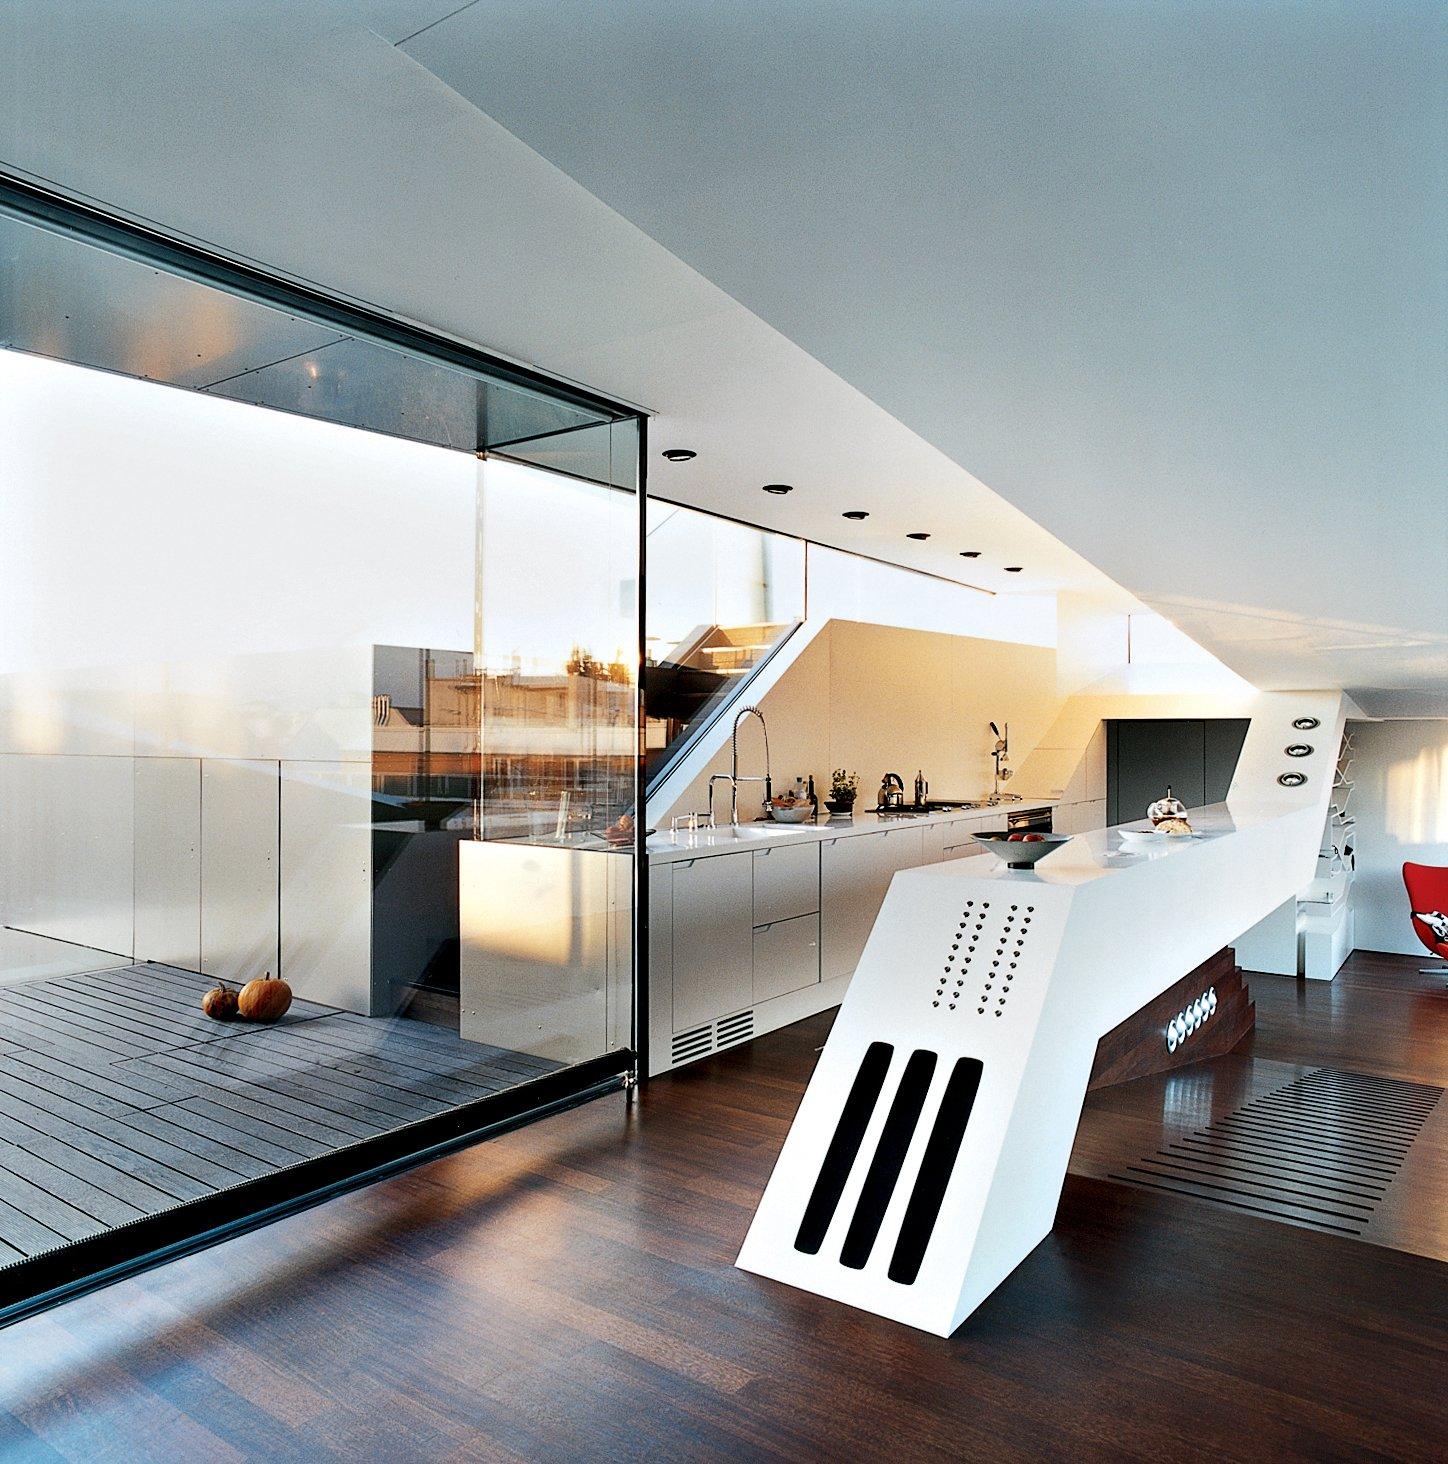 #modern #penthouse #kitchen #raised #platform  Photo by Hertha Hurnuas  Kitchen